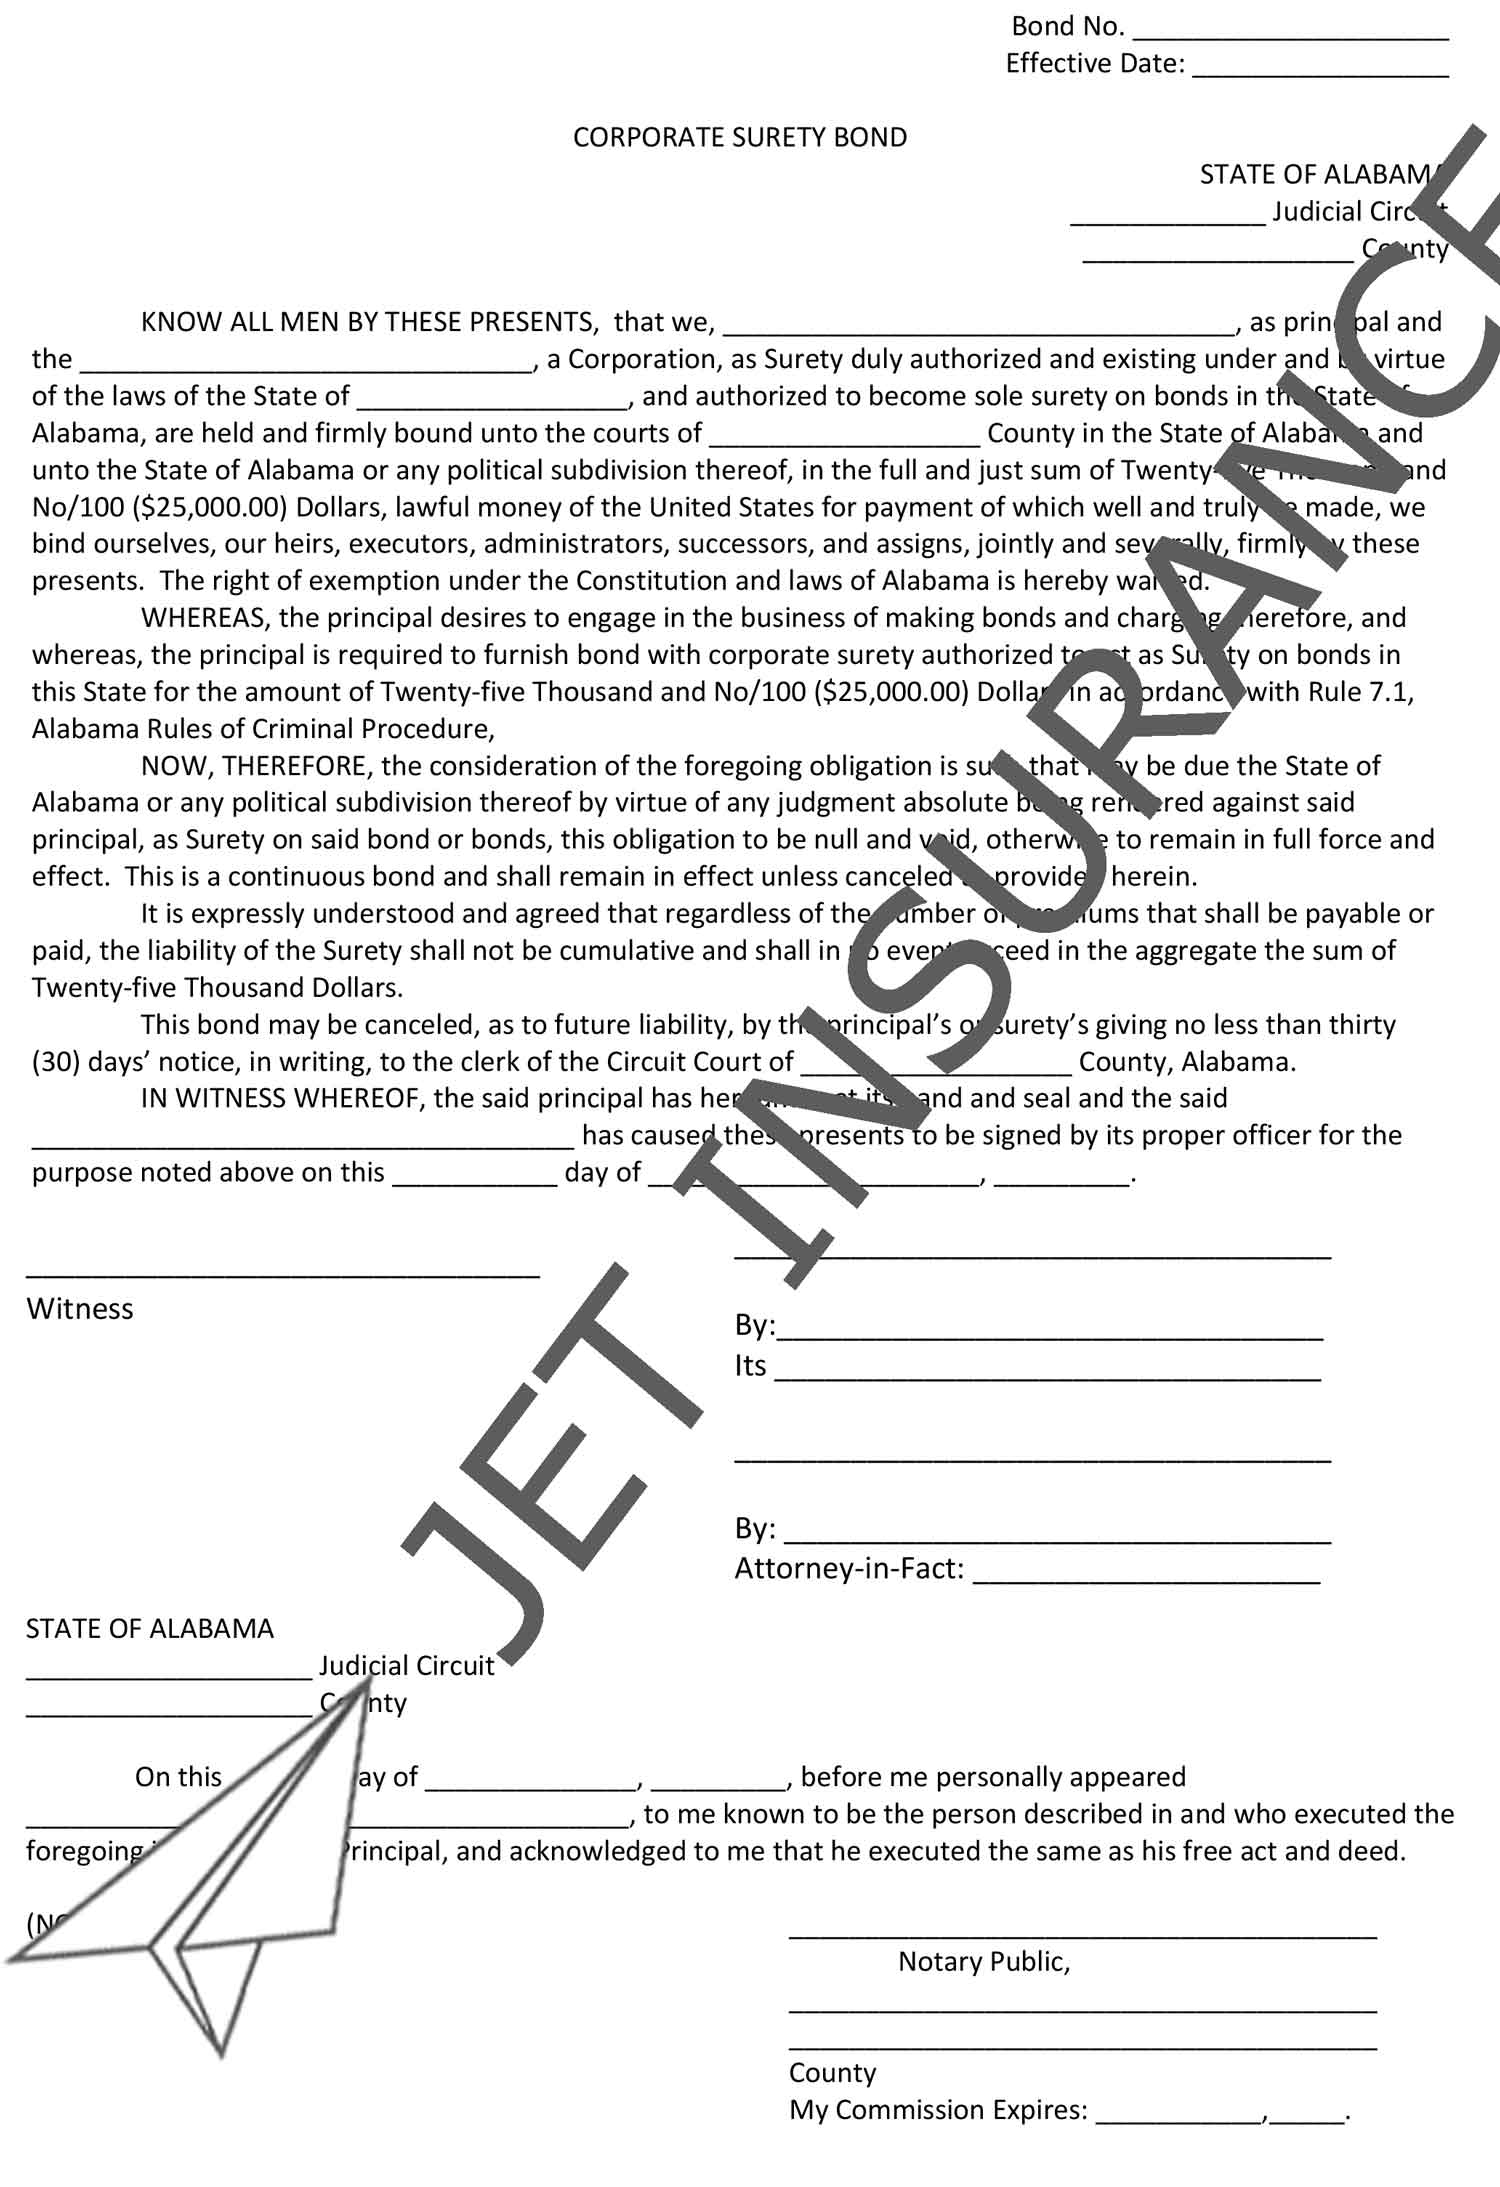 Alabama Bail Bondsman Bond Form